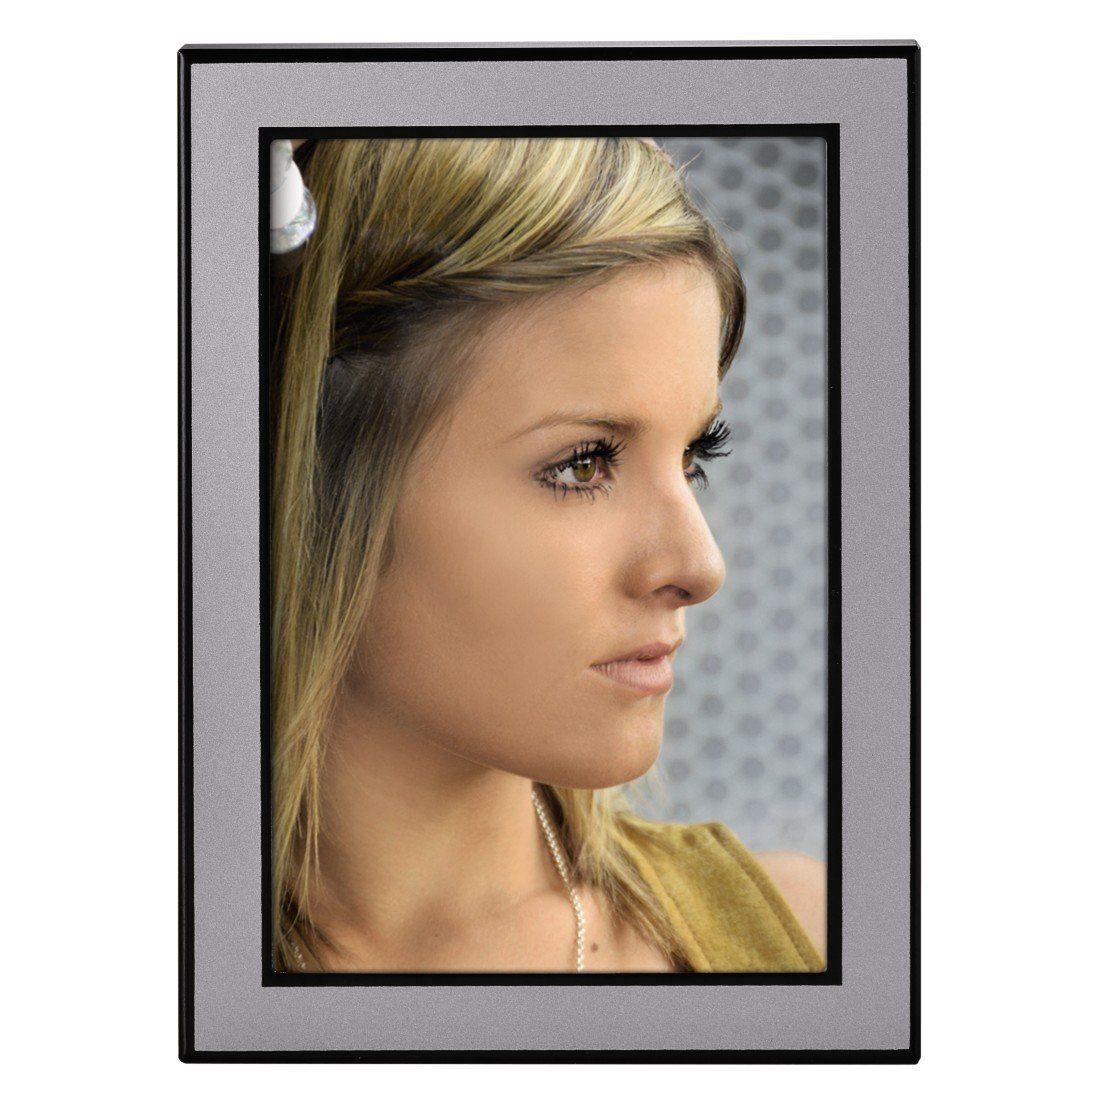 Hama Porträtrahmen Philadelphia, 13 x 18 cm, Silber/Schwarz